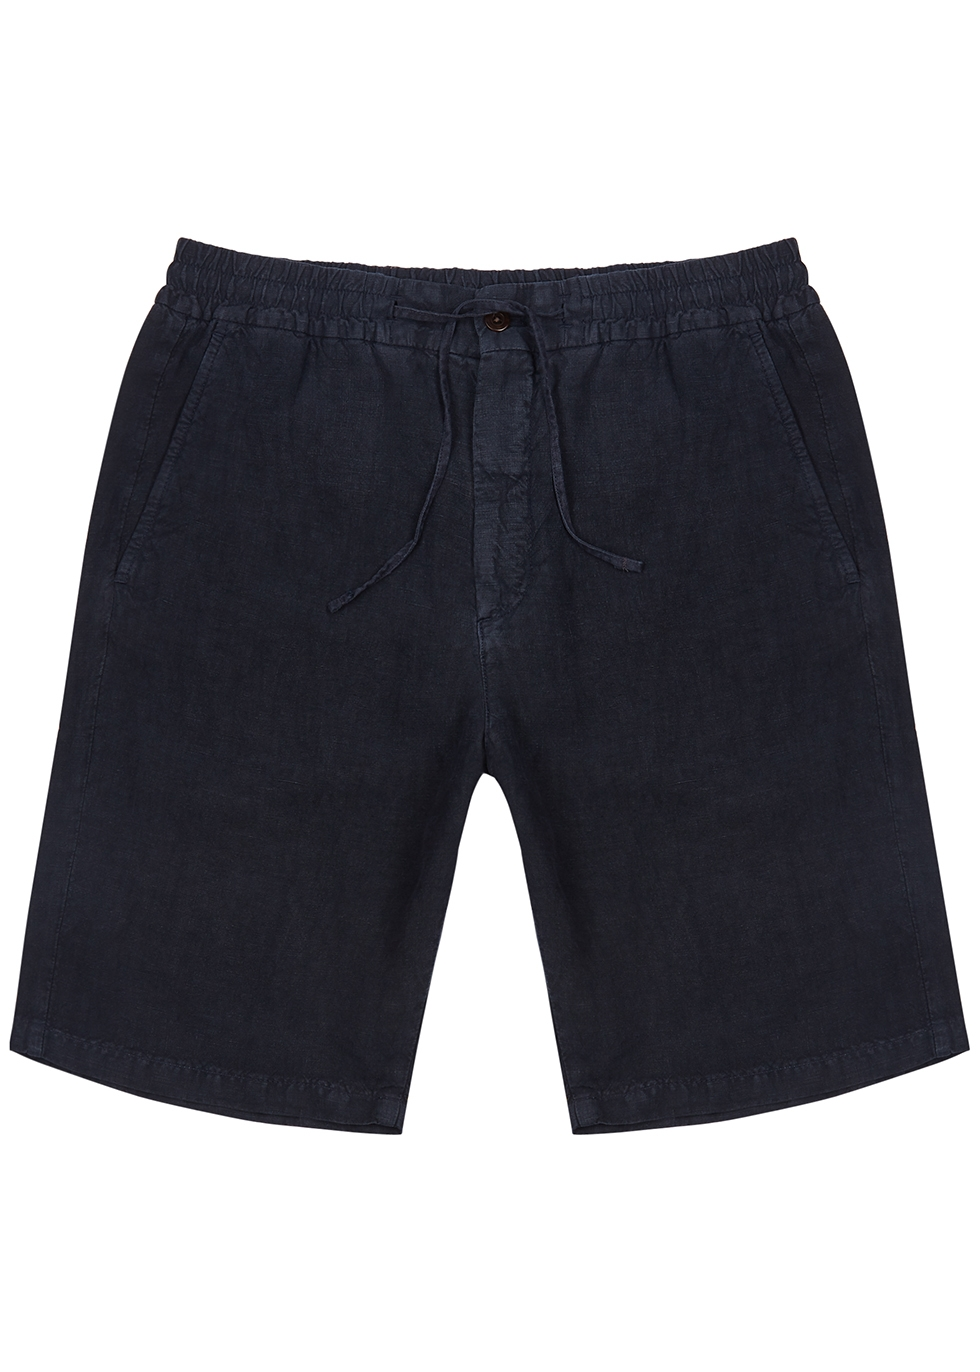 Seb navy linen shorts